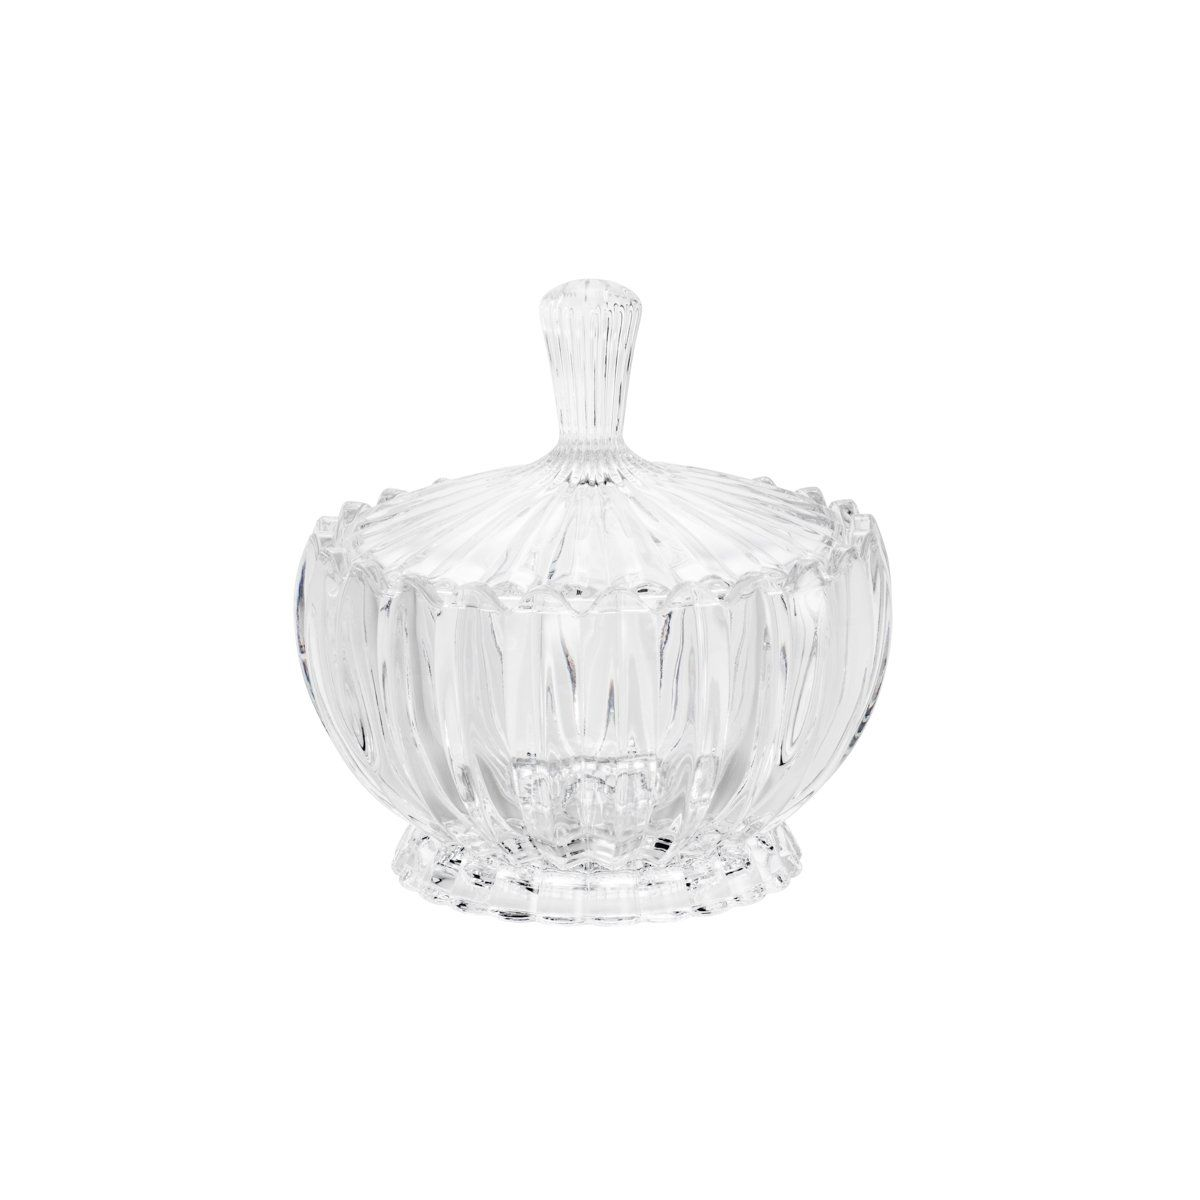 Bomboniere 17,5 cm de cristal transparente com tampa Geneva Wolff - 25530